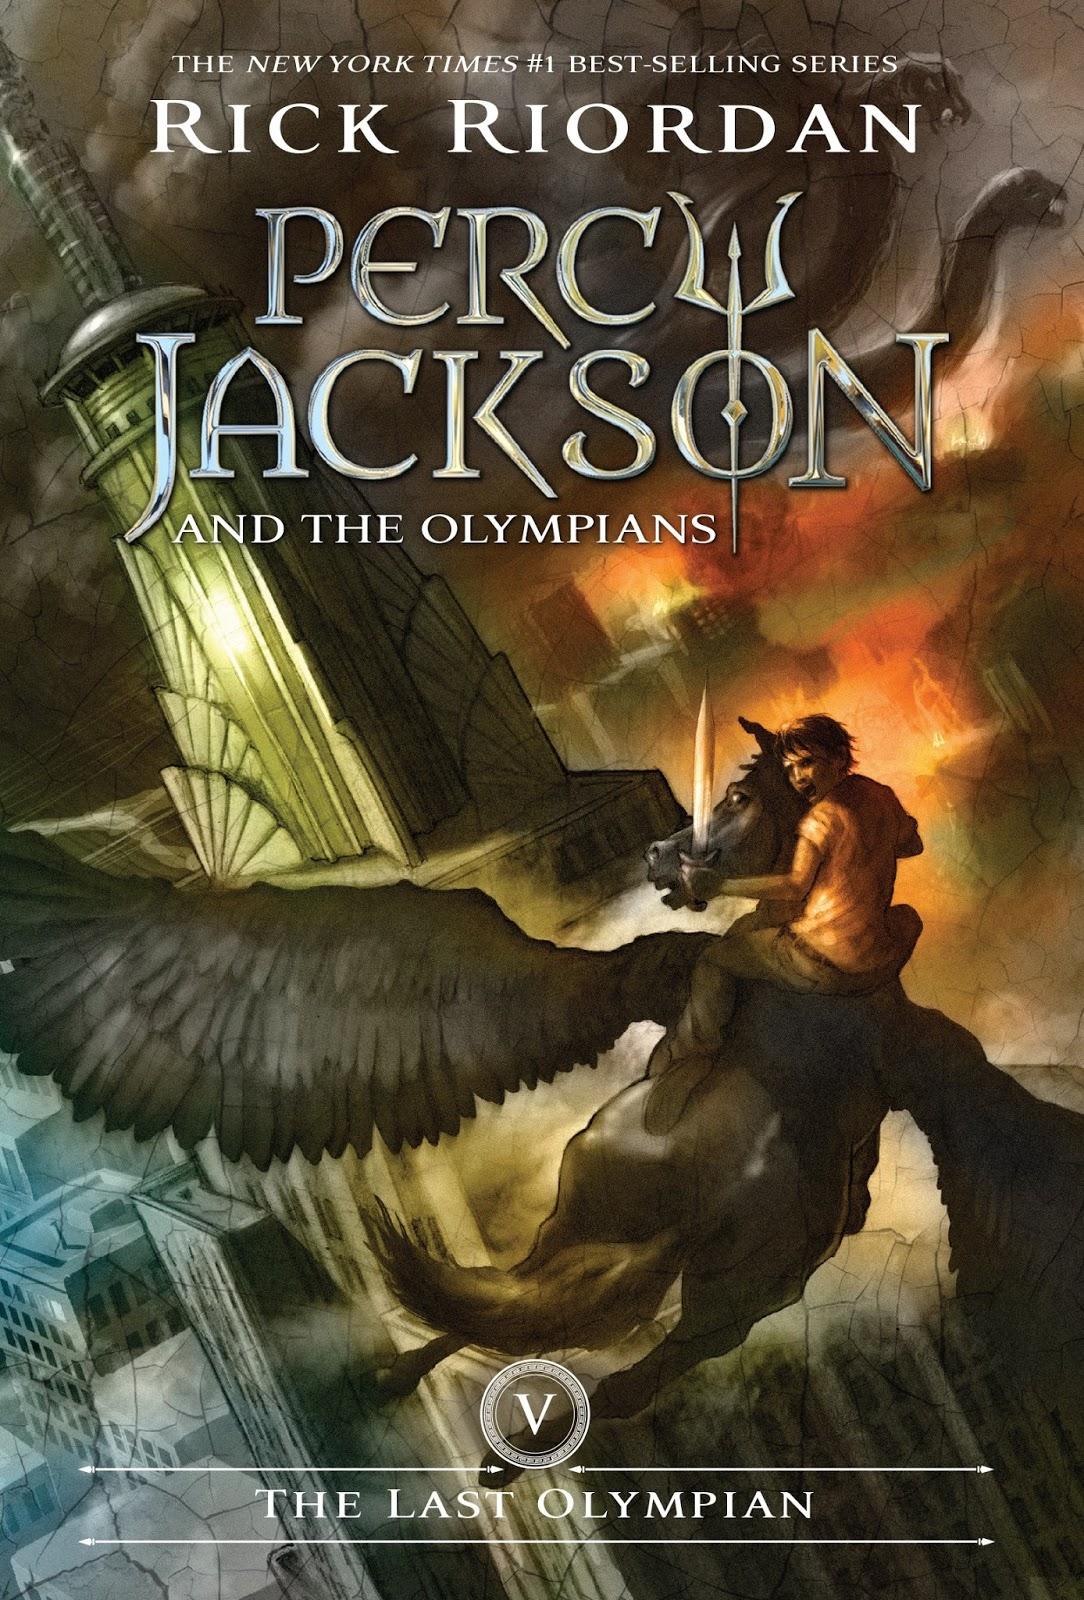 Rick Riordan - Percy Jackson   the Olympians - THE LAST OLYMPIAN